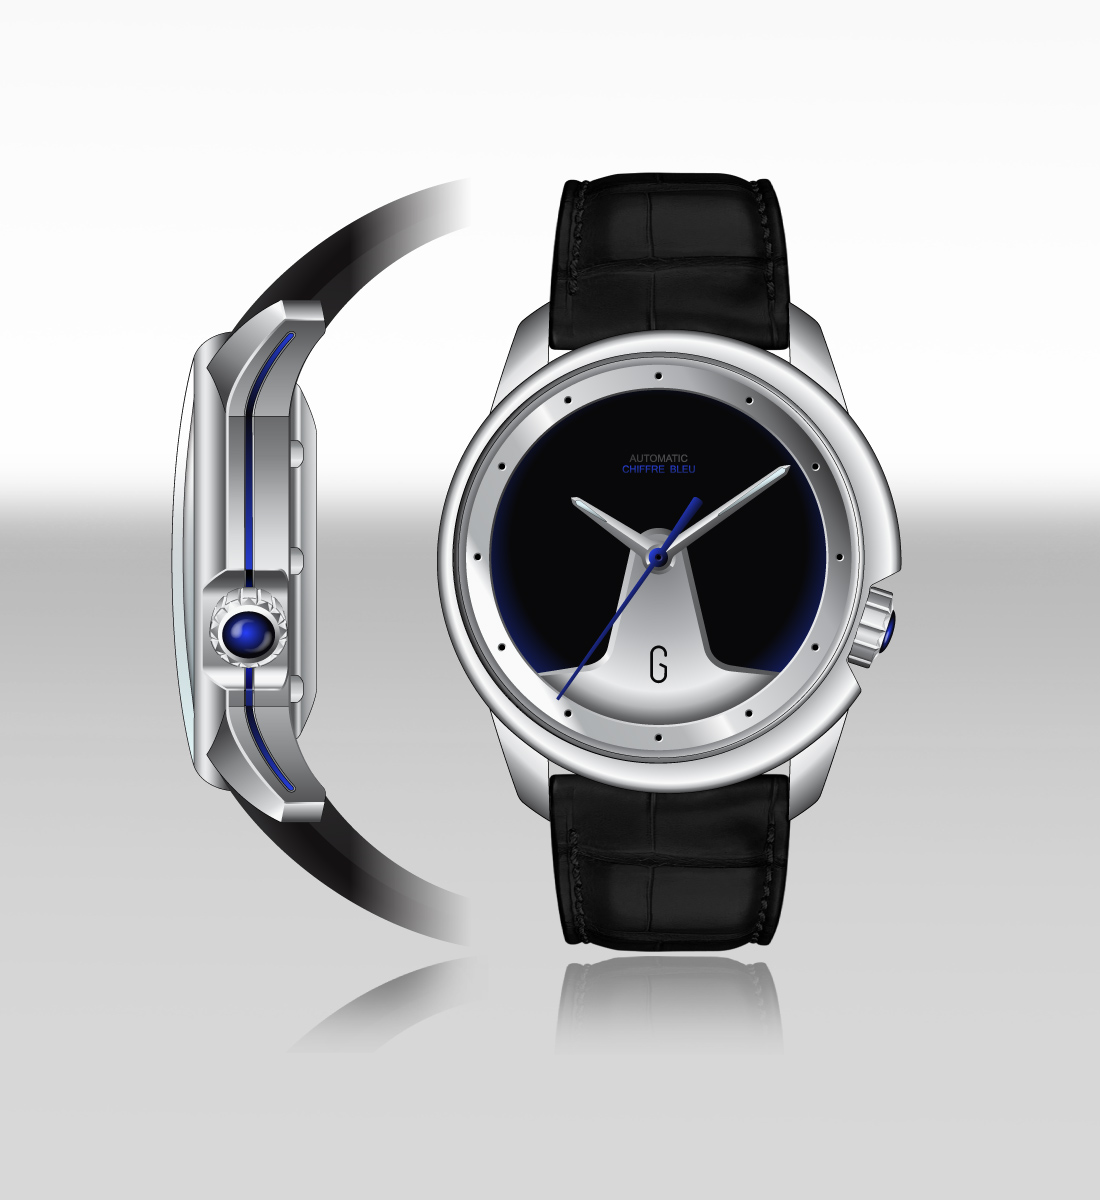 Galbe-Chiffre-Bleu-Gde-Vignette-1100X1200px.jpg